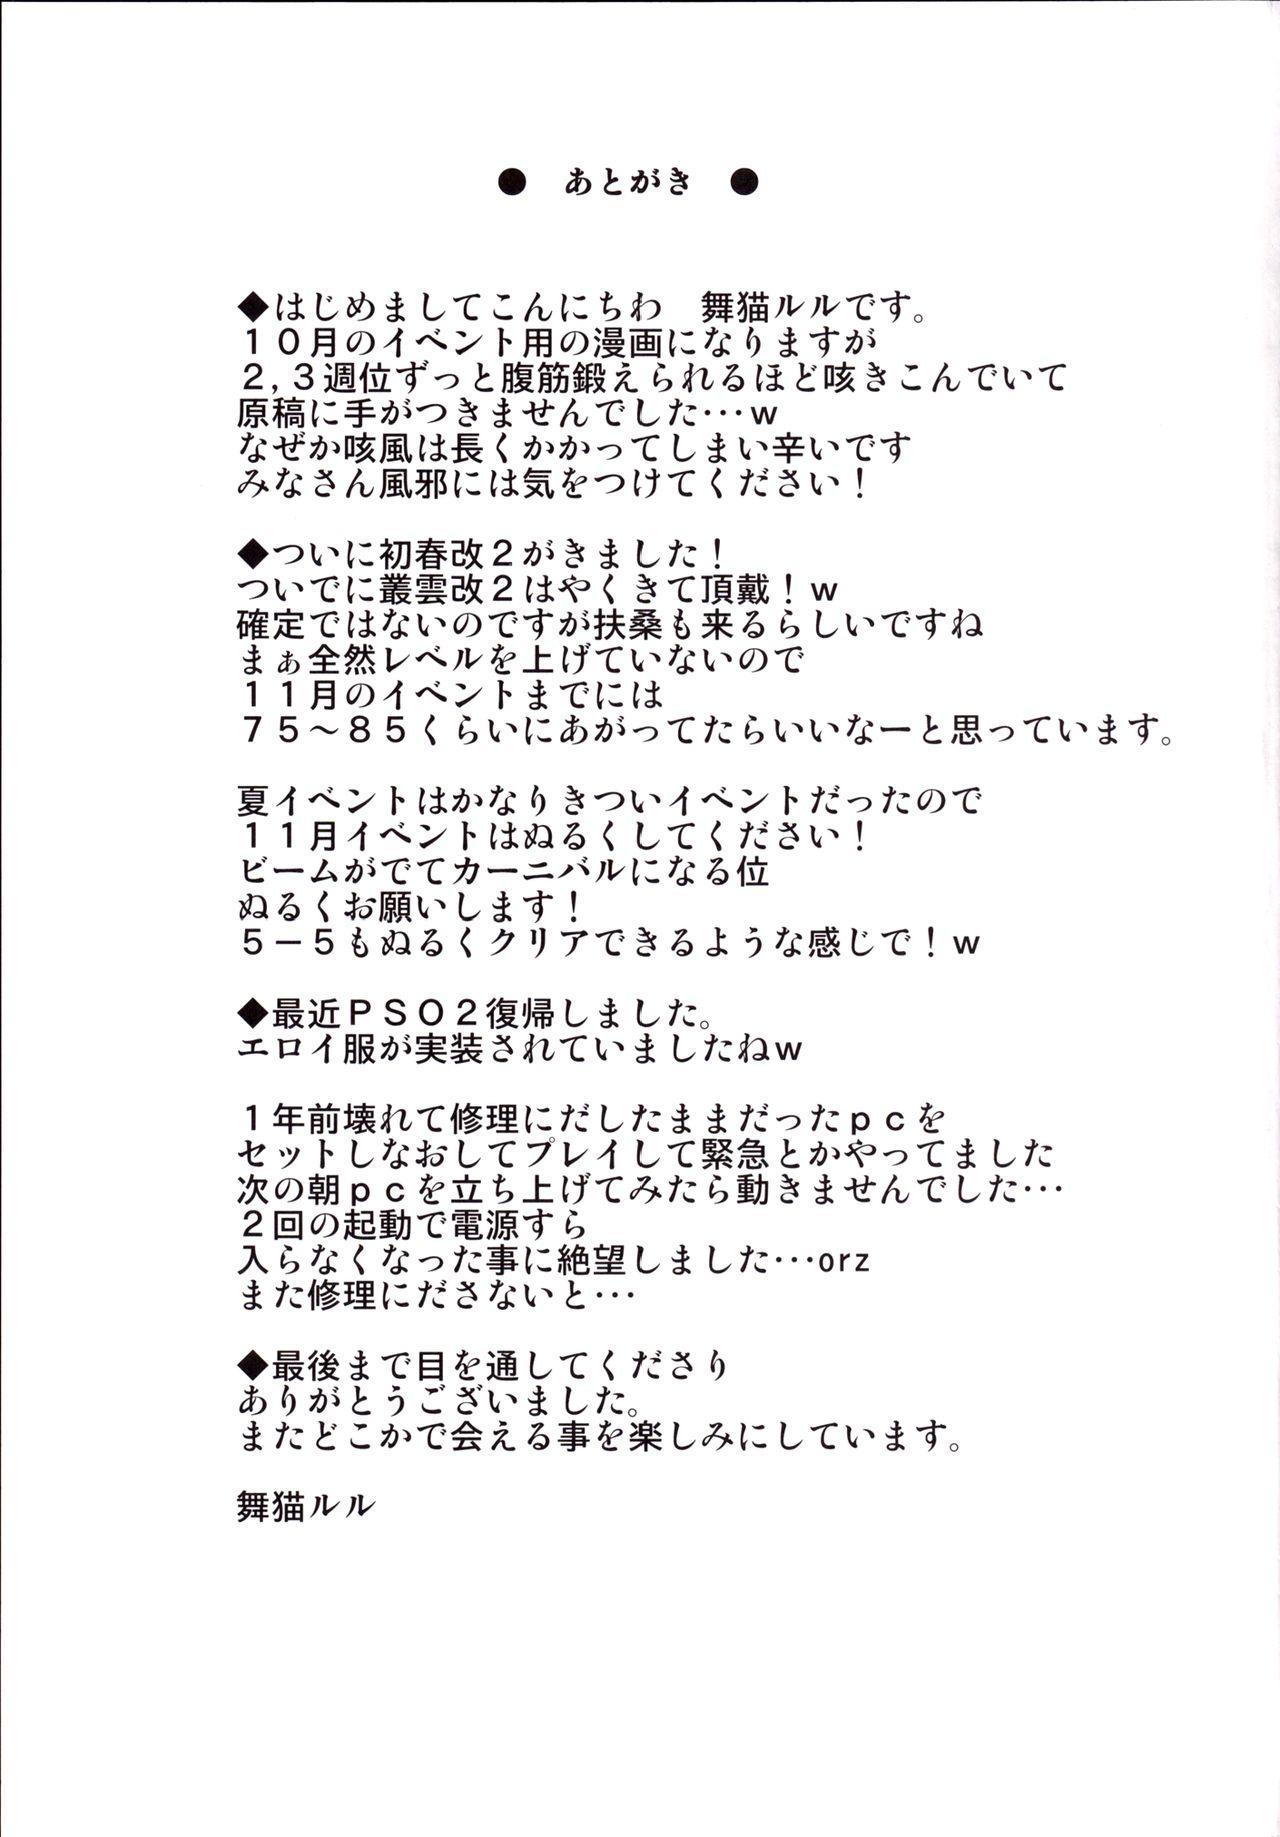 Koiiro Moyou 9 19